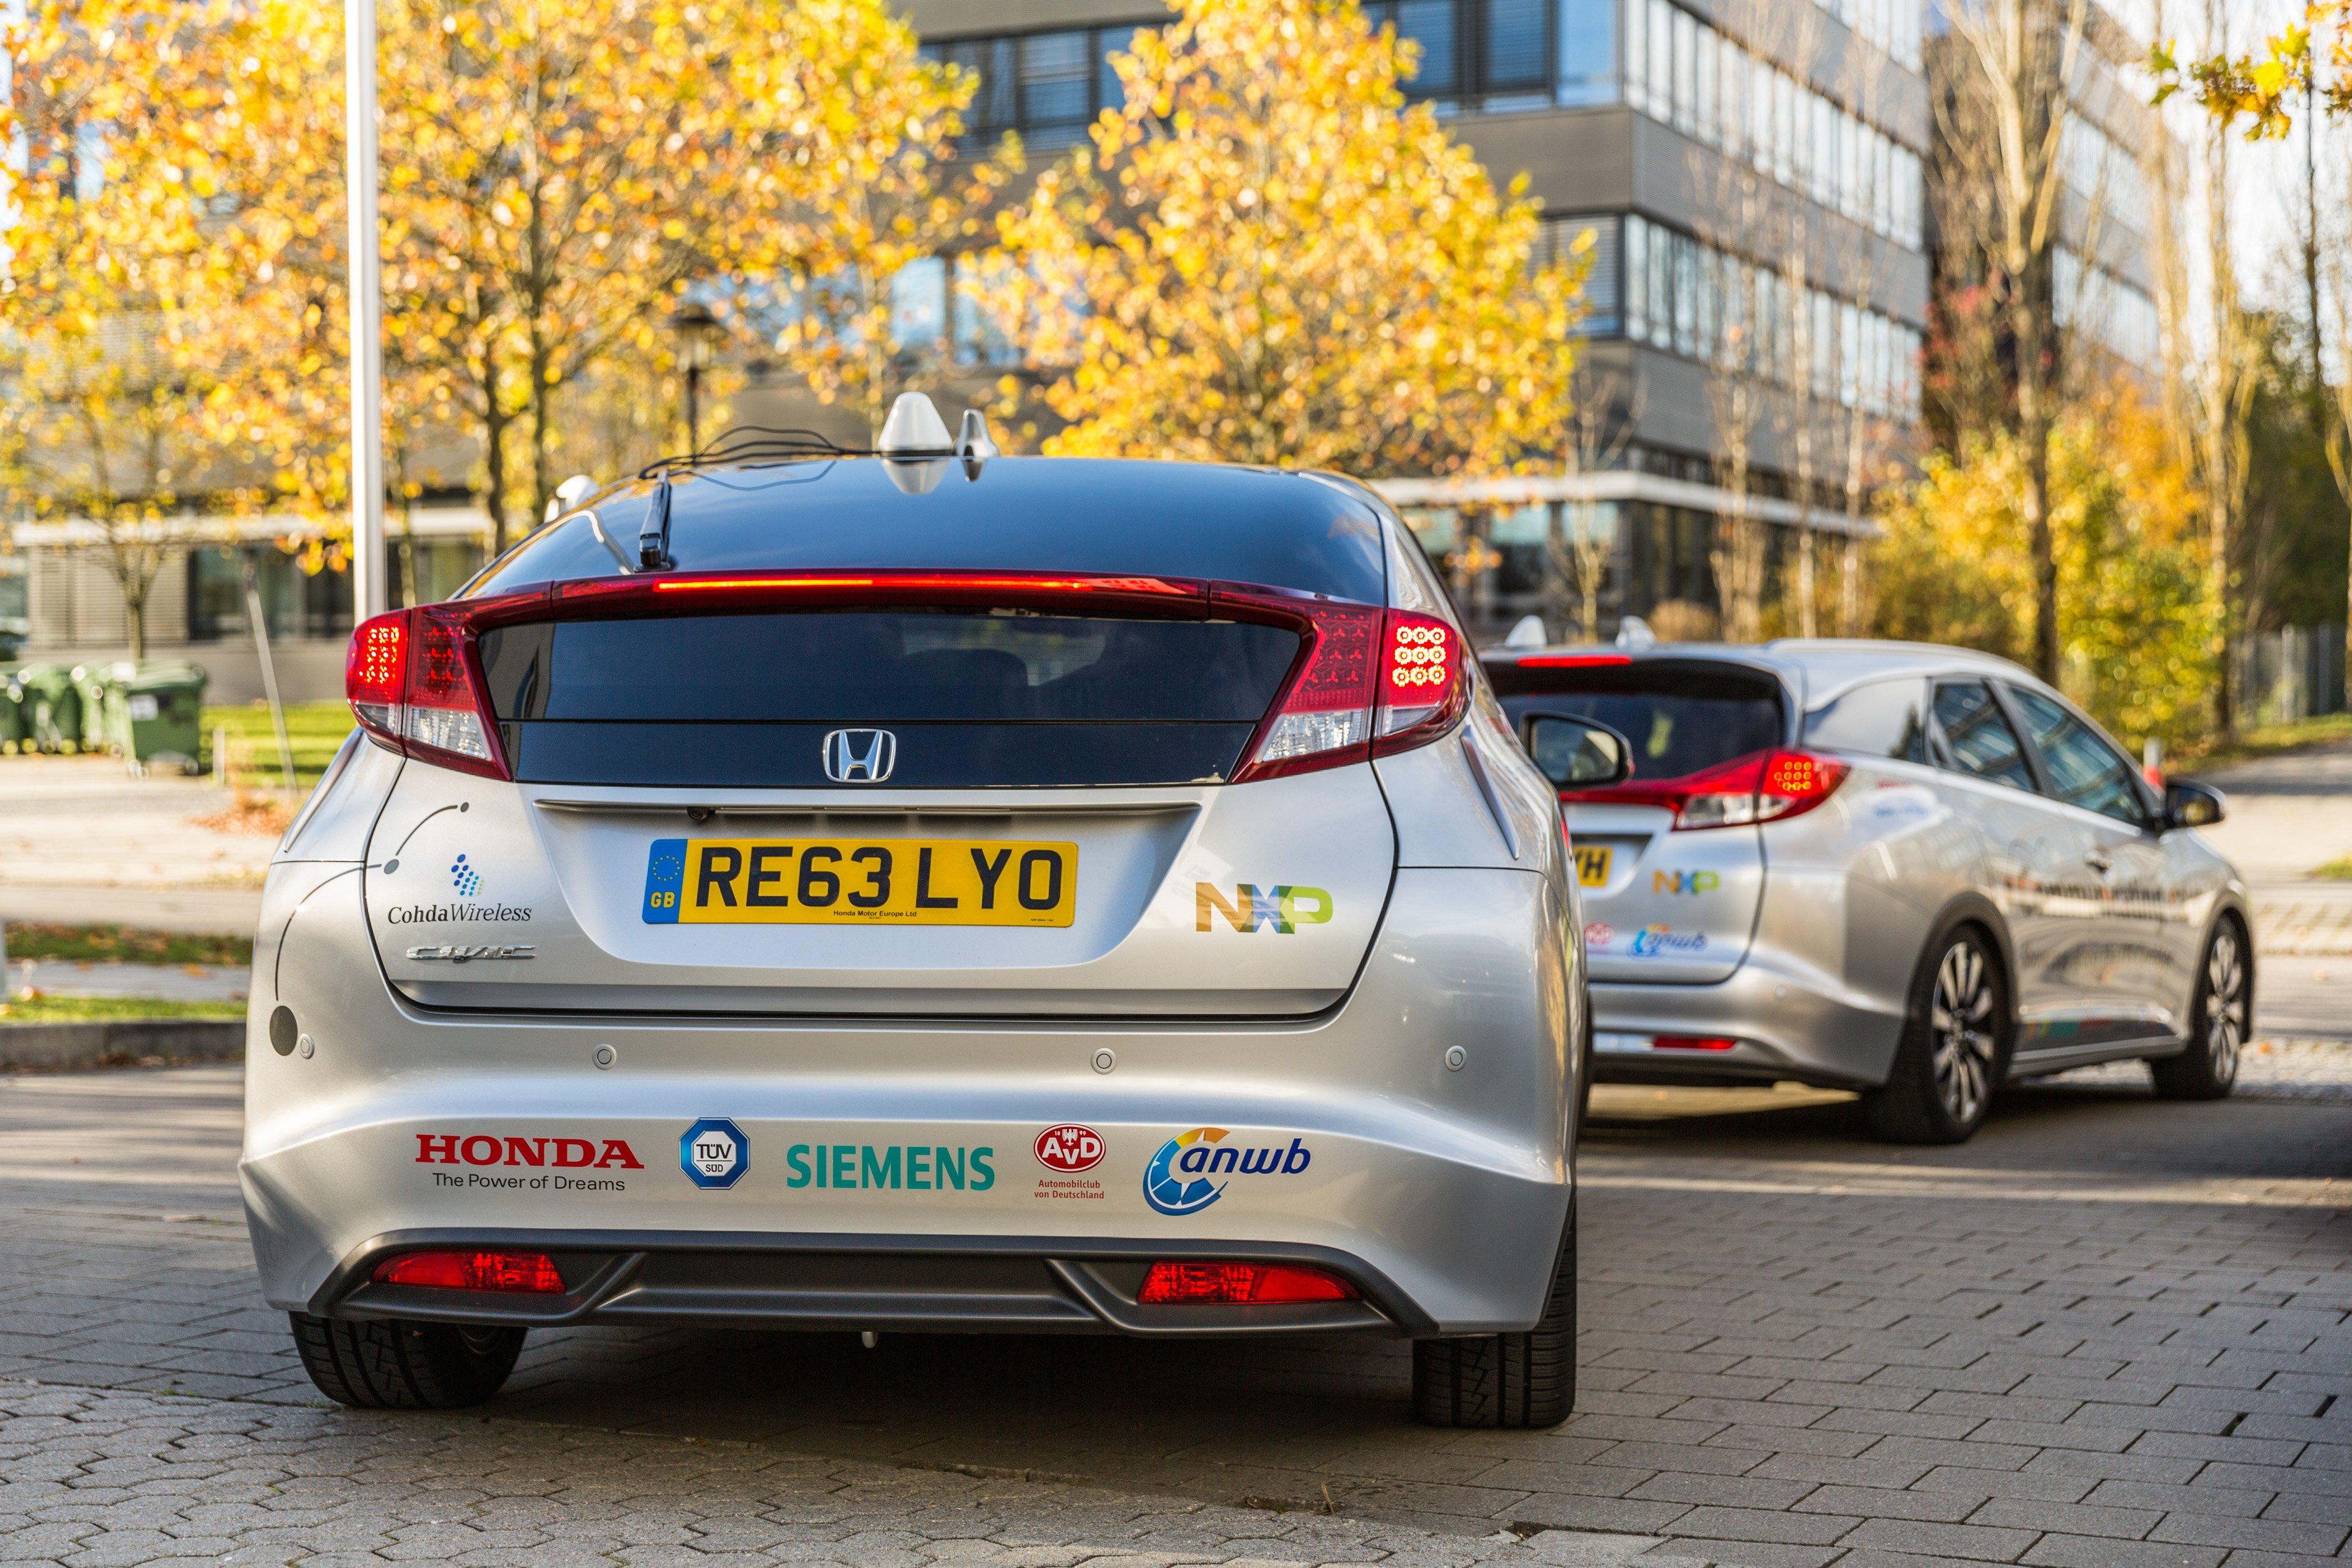 Nxp honda and siemens launch smart car corridor test for Honda smart car